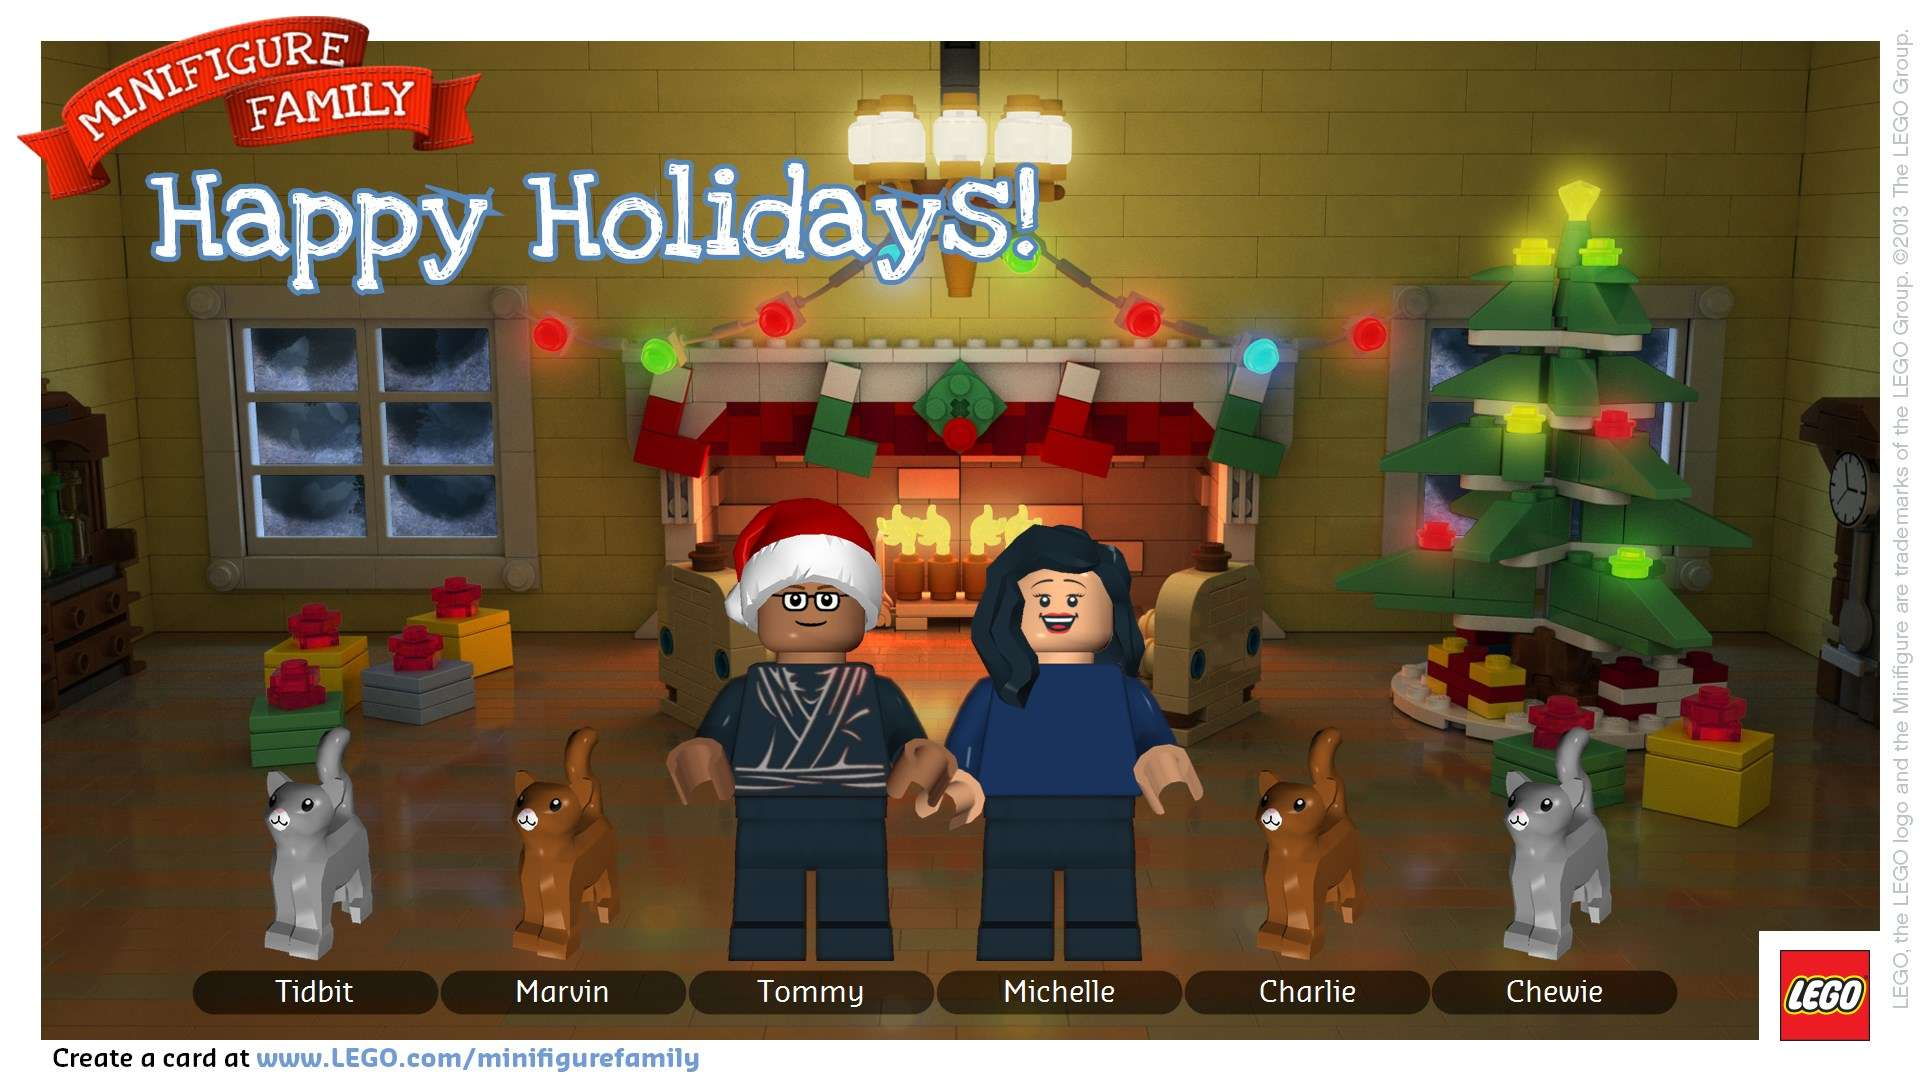 LEGO Minifigure Holiday Greetings